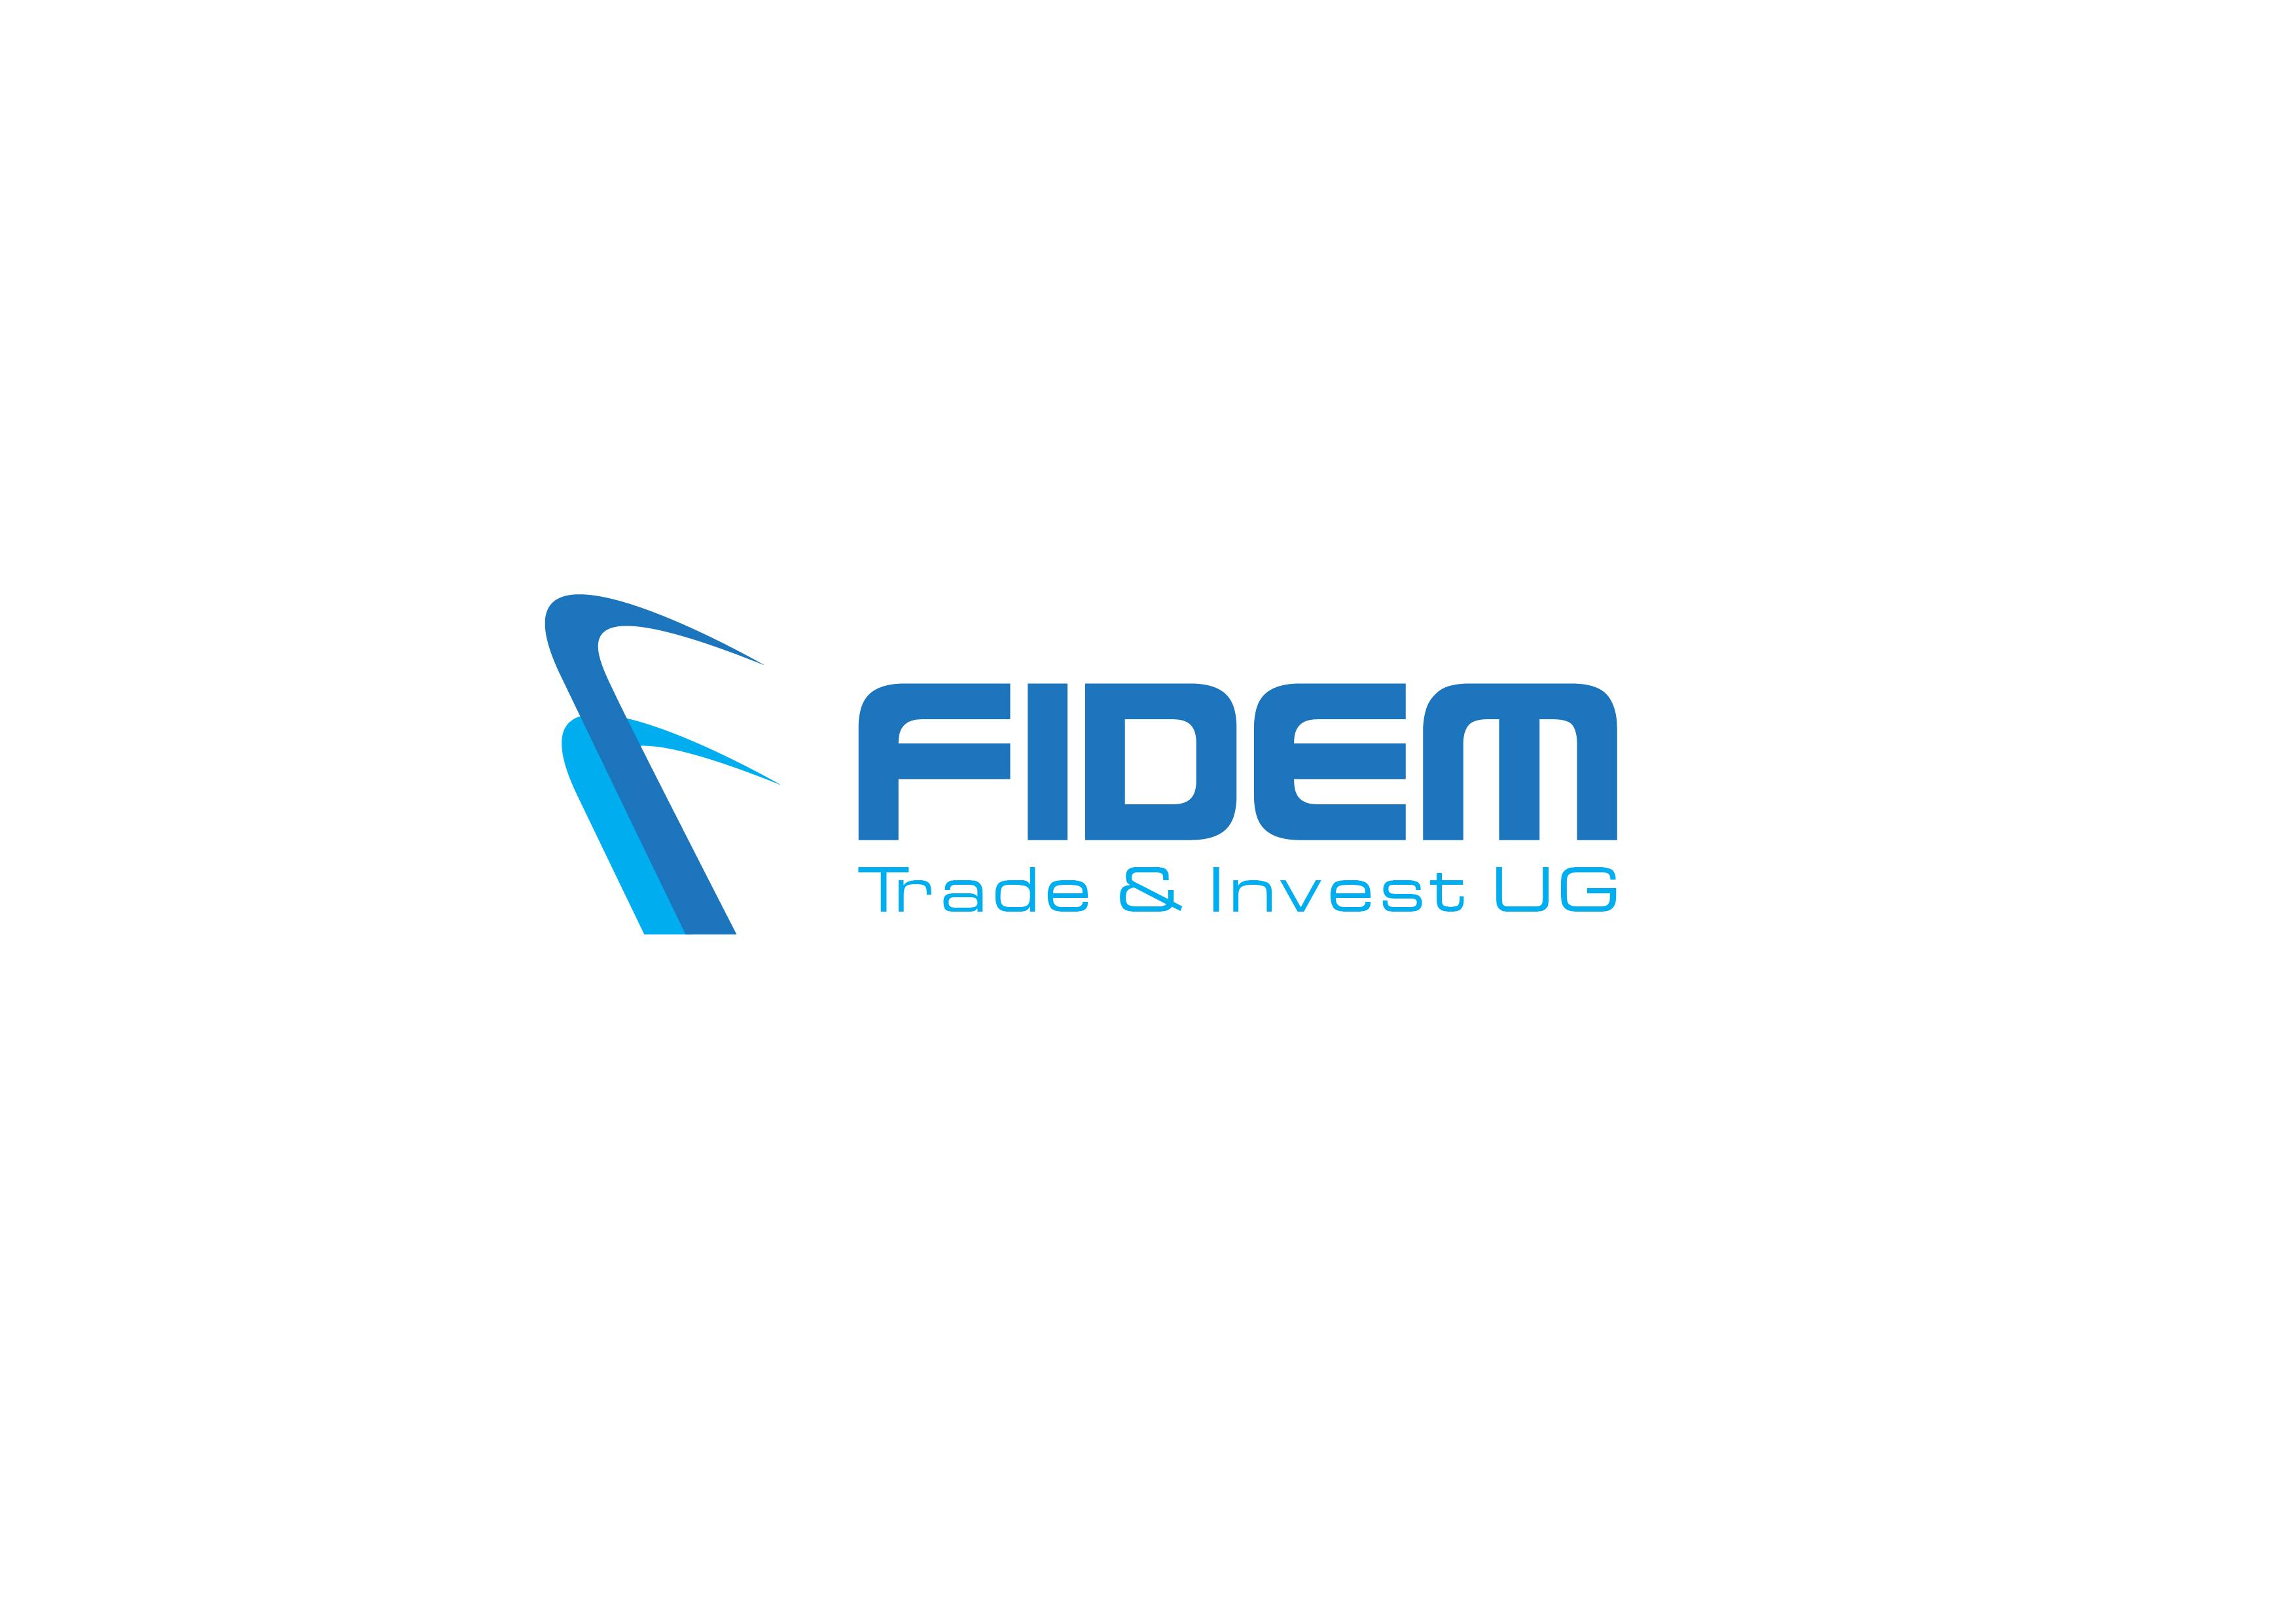 Logo Design by 3draw - Entry No. 702 in the Logo Design Contest Professional Logo Design for FIDEM Trade & Invest UG.